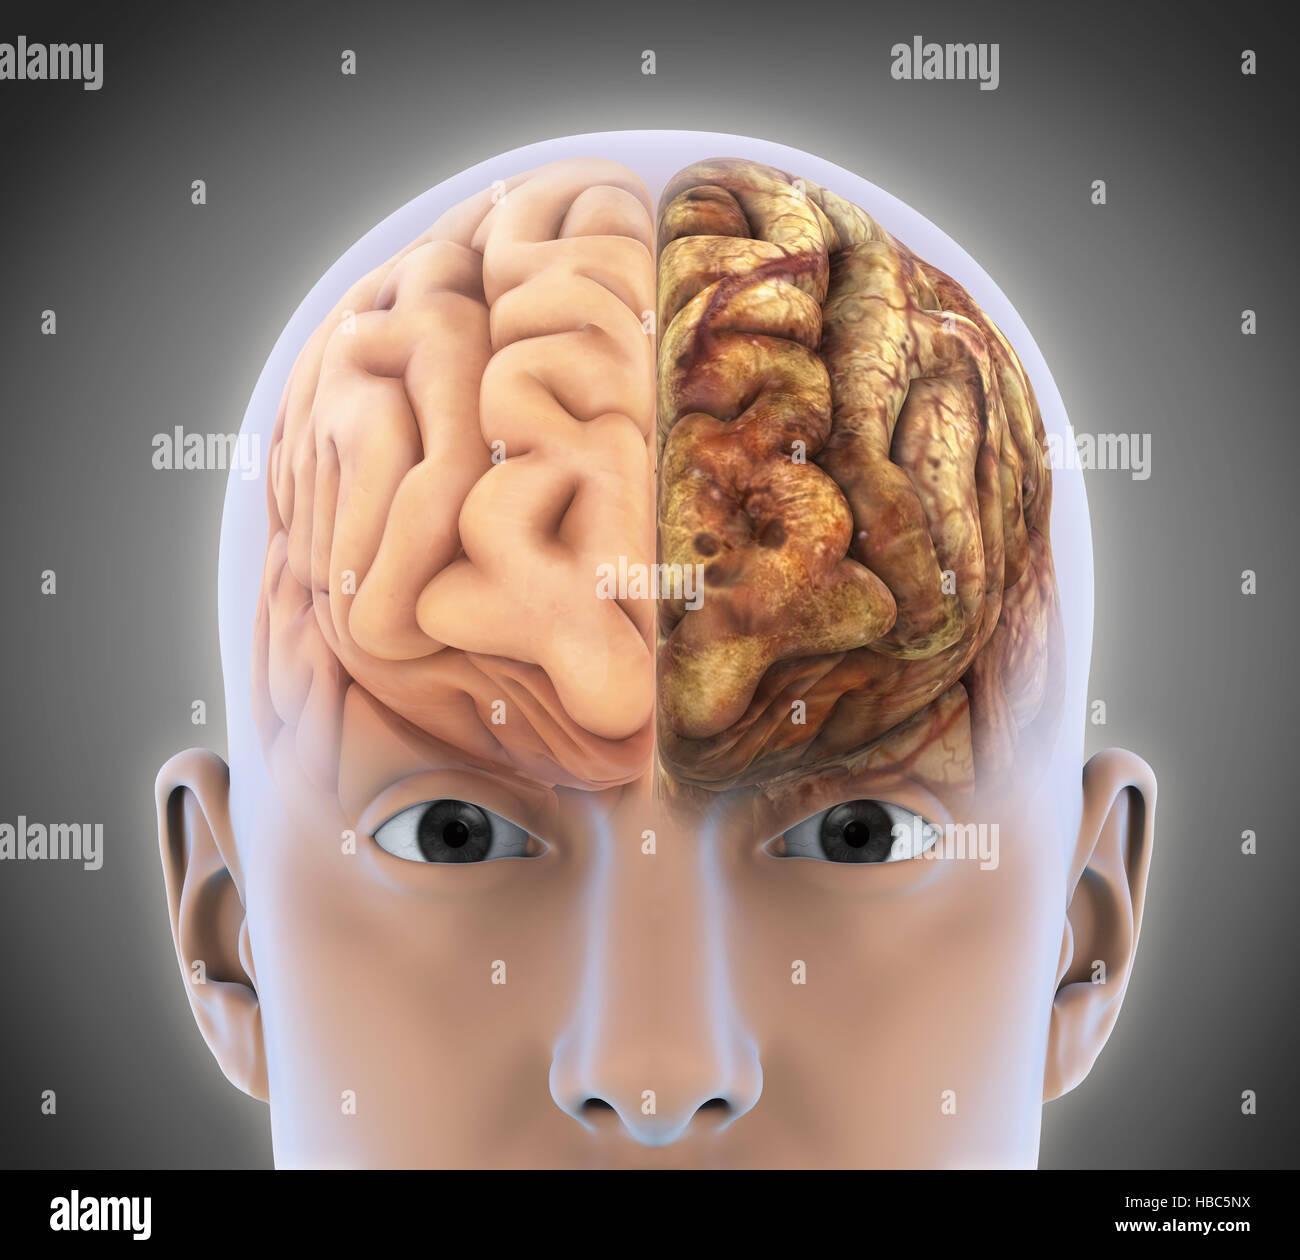 Mri Of Brain Tumor Stock Photos & Mri Of Brain Tumor Stock Images ...